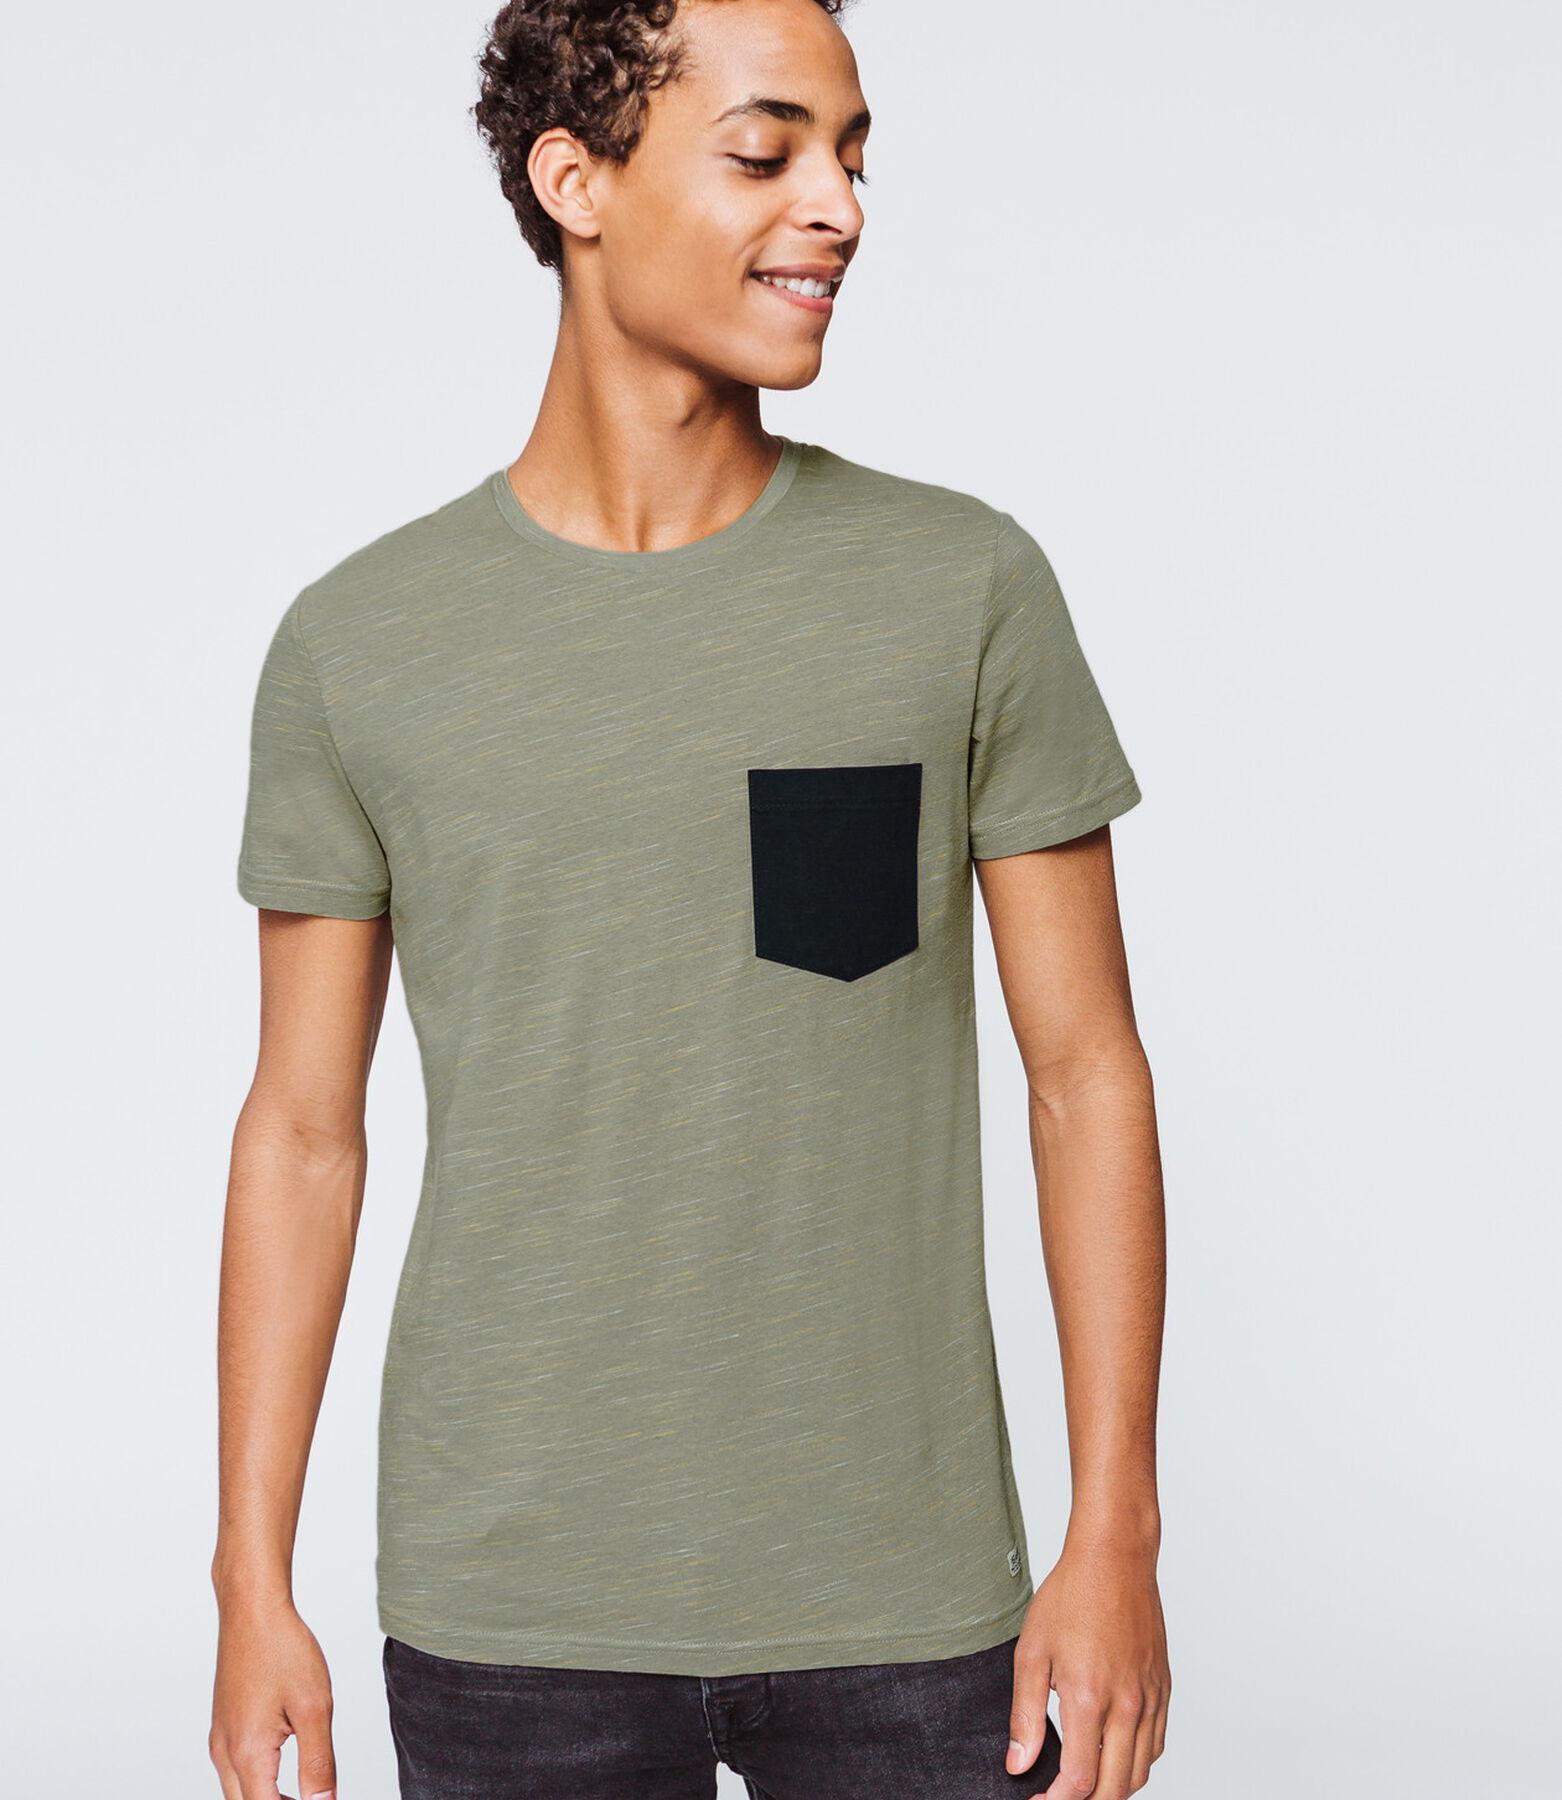 T-shirt injecté poche poitrine